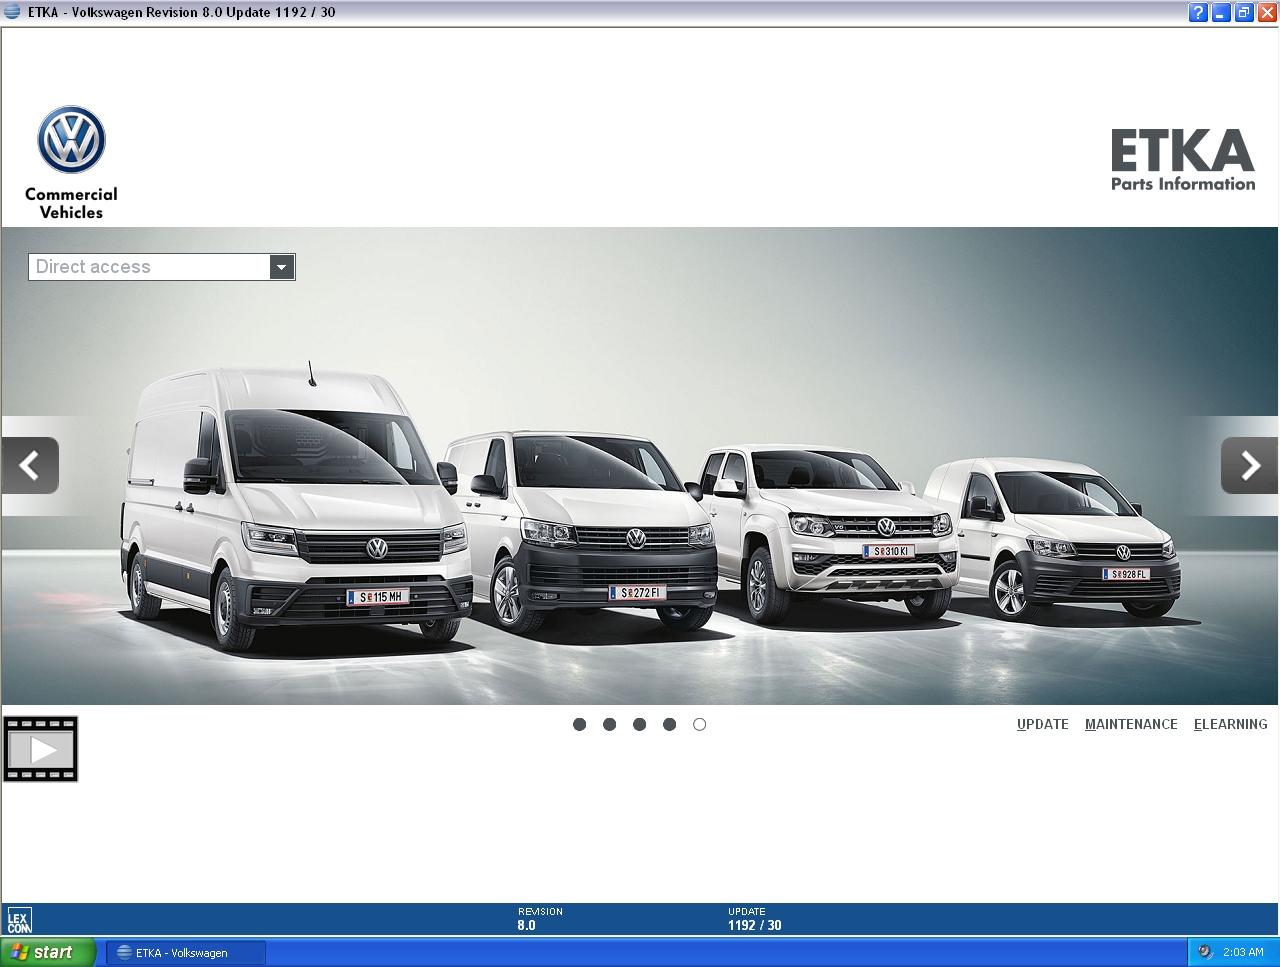 ETKA 8 1 - AUDI, VW, SEAT, SKODA [05 2019] Parts Catalog